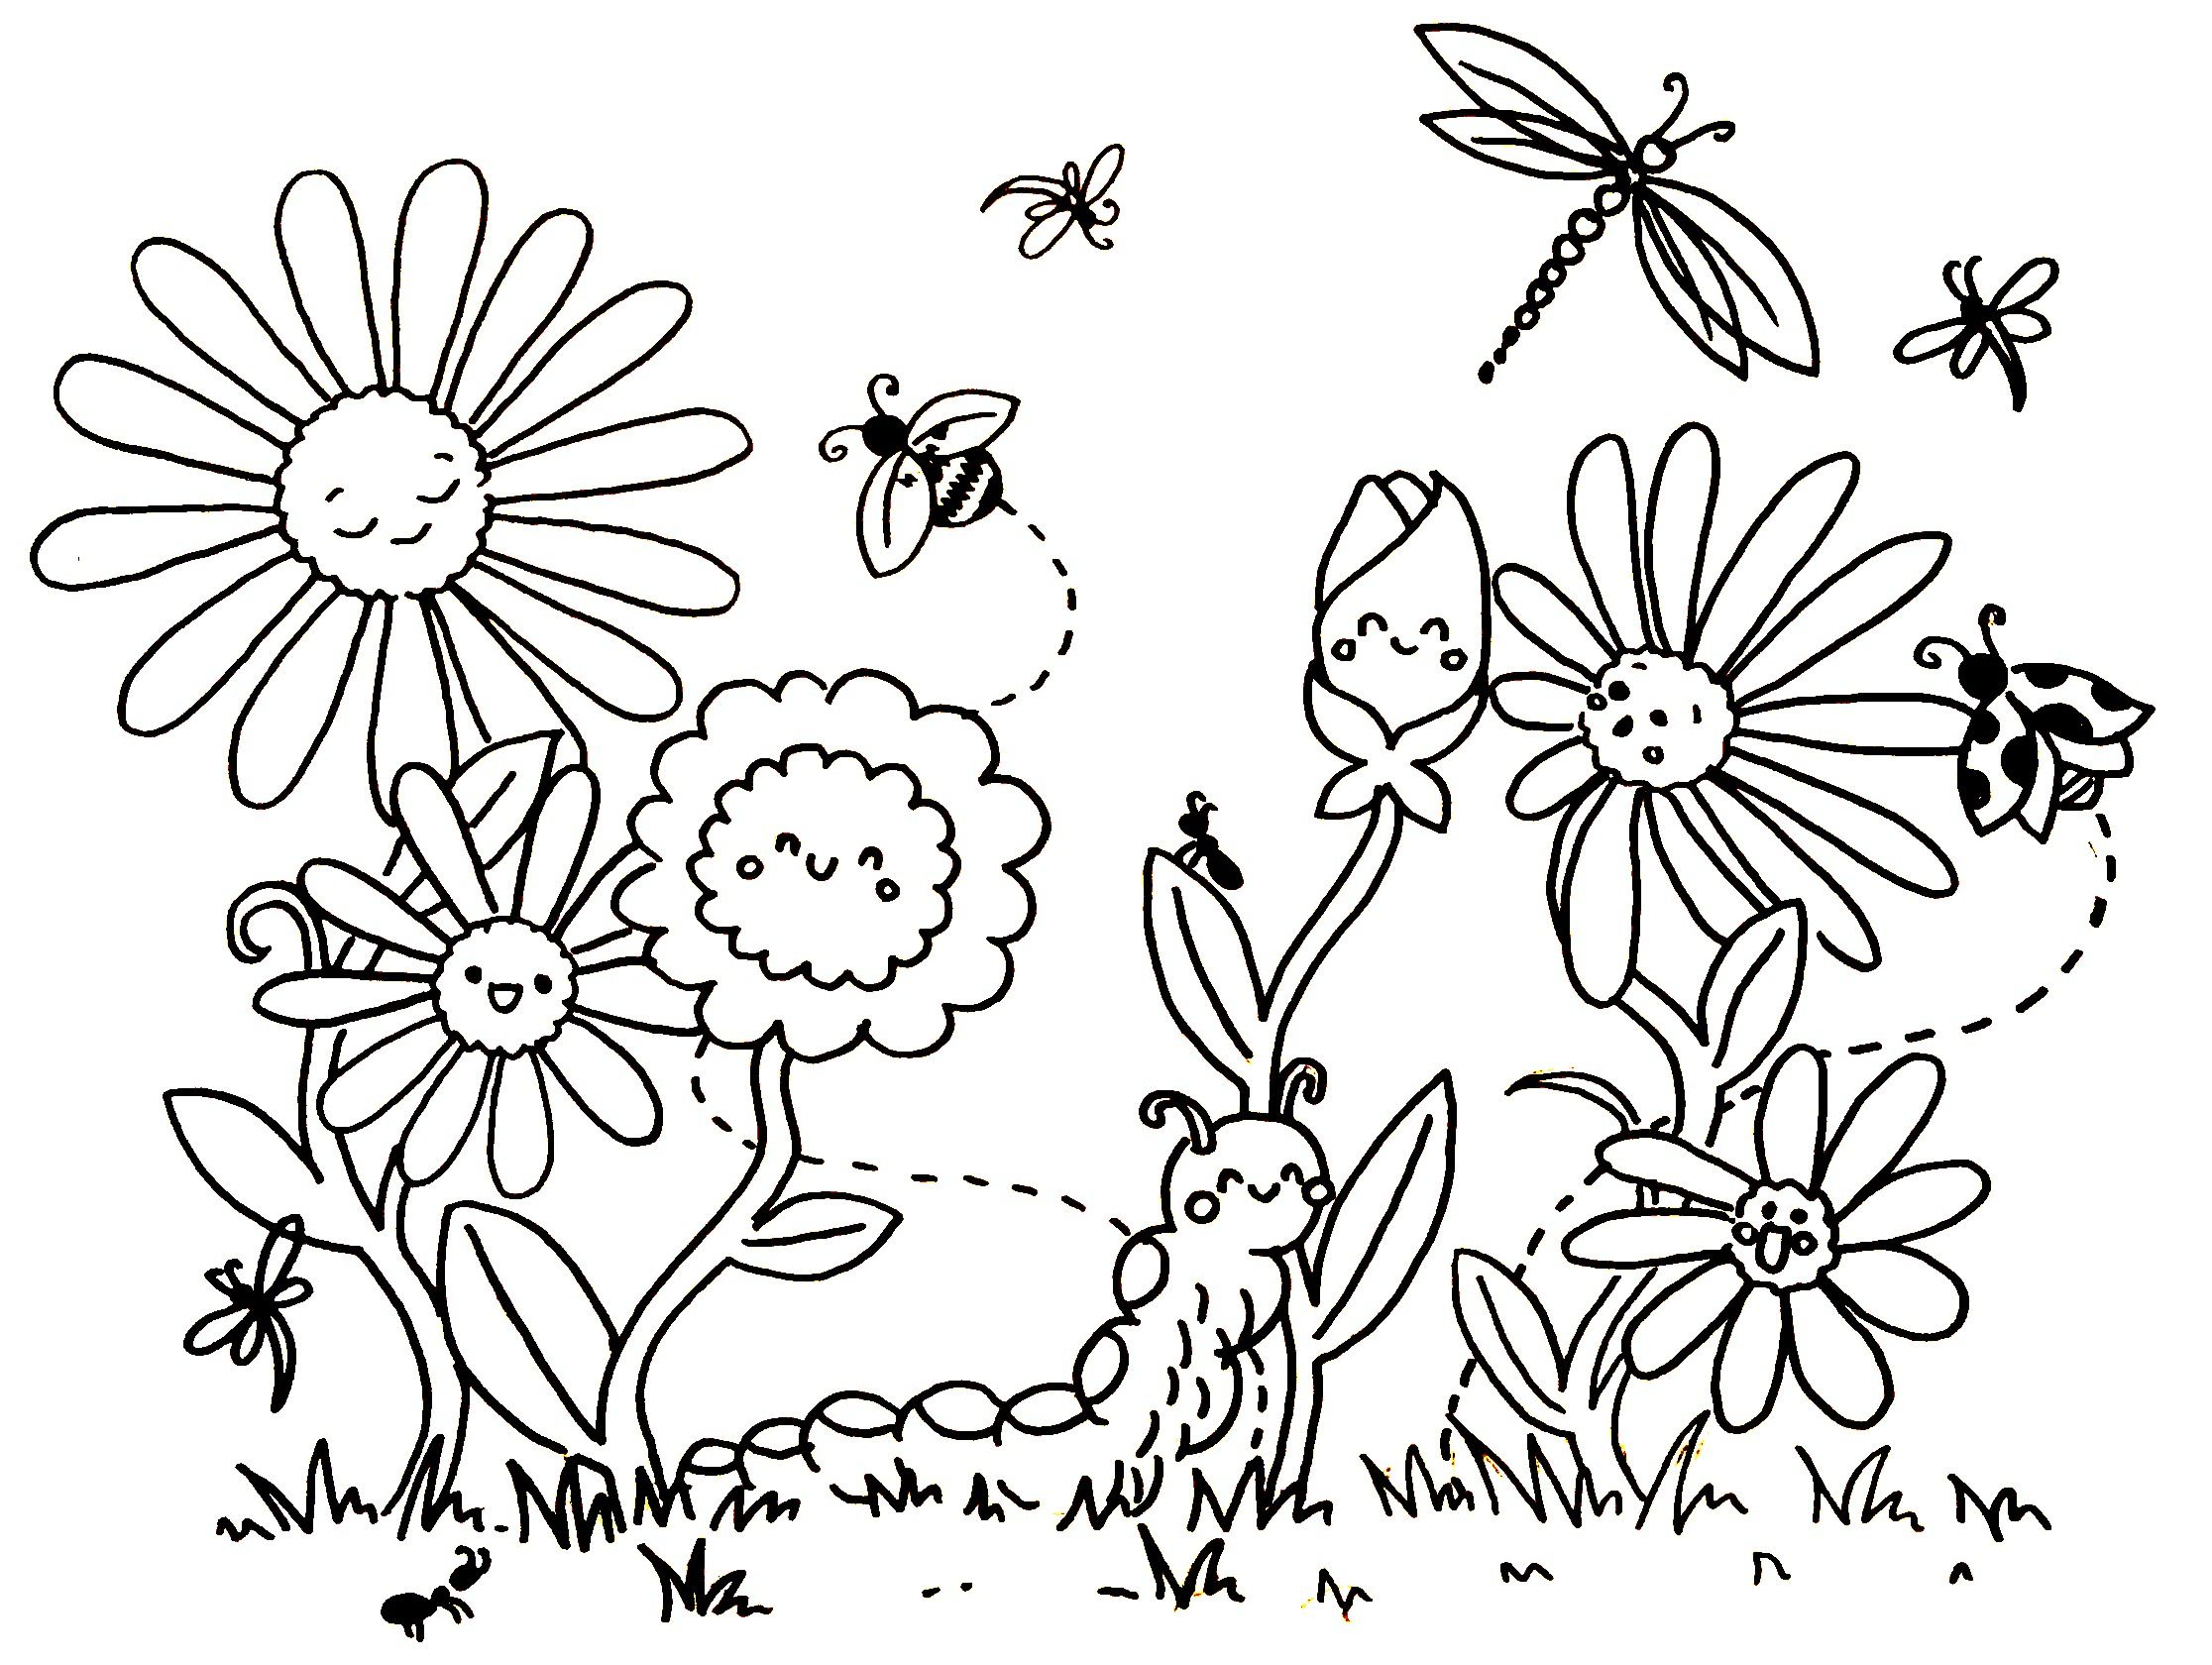 Fruhling Blumen Ausmalen Ausmalen Blumen Ausmalbilder